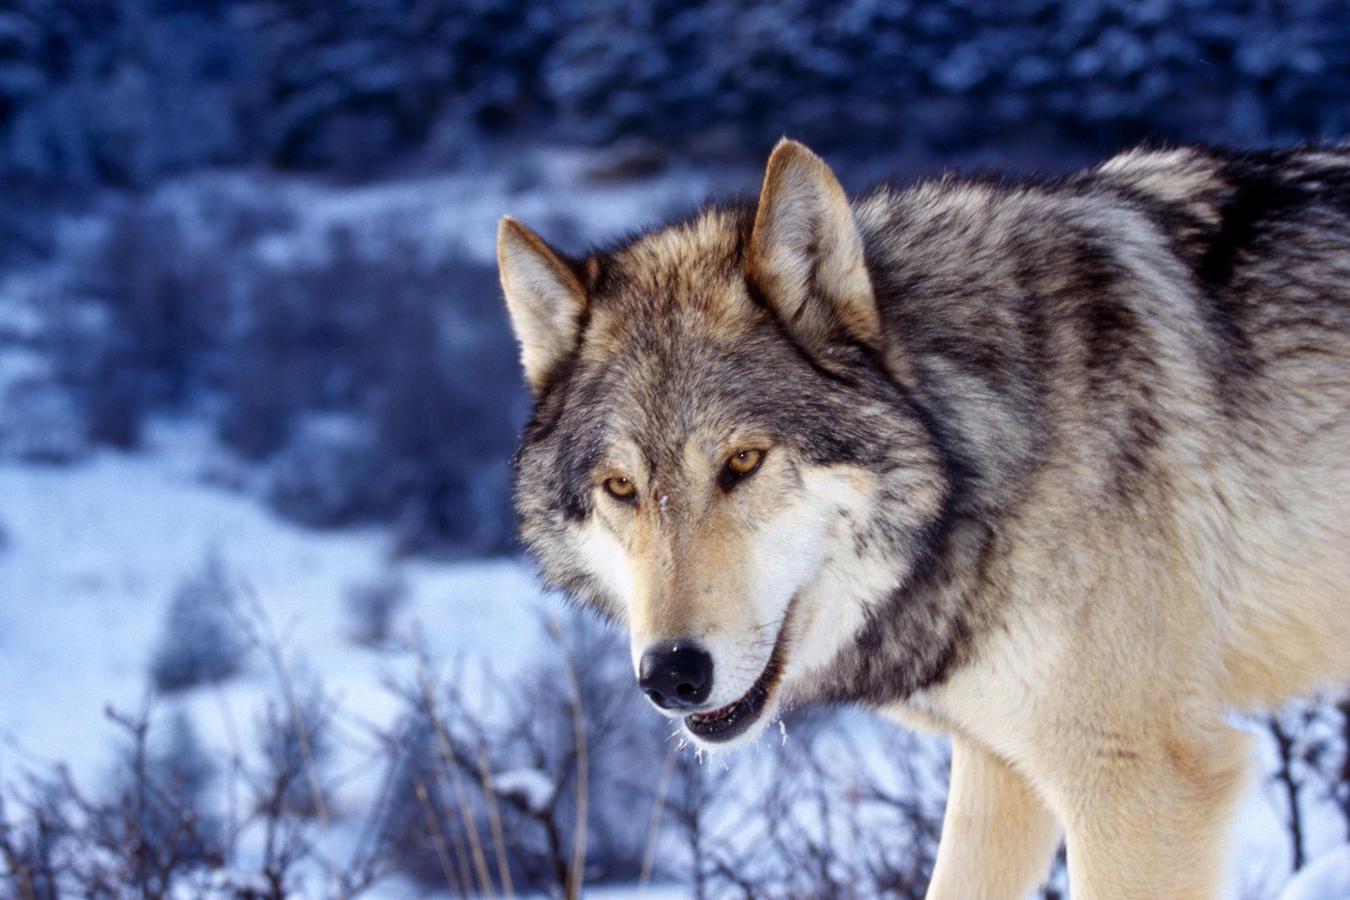 http://2.bp.blogspot.com/-aDWUfDL9T0s/UEa3yENN4II/AAAAAAAABiU/yGrkTW00z0A/s1600/Wolf%2BWallpapers%2BWidescreen%2B2.jpg